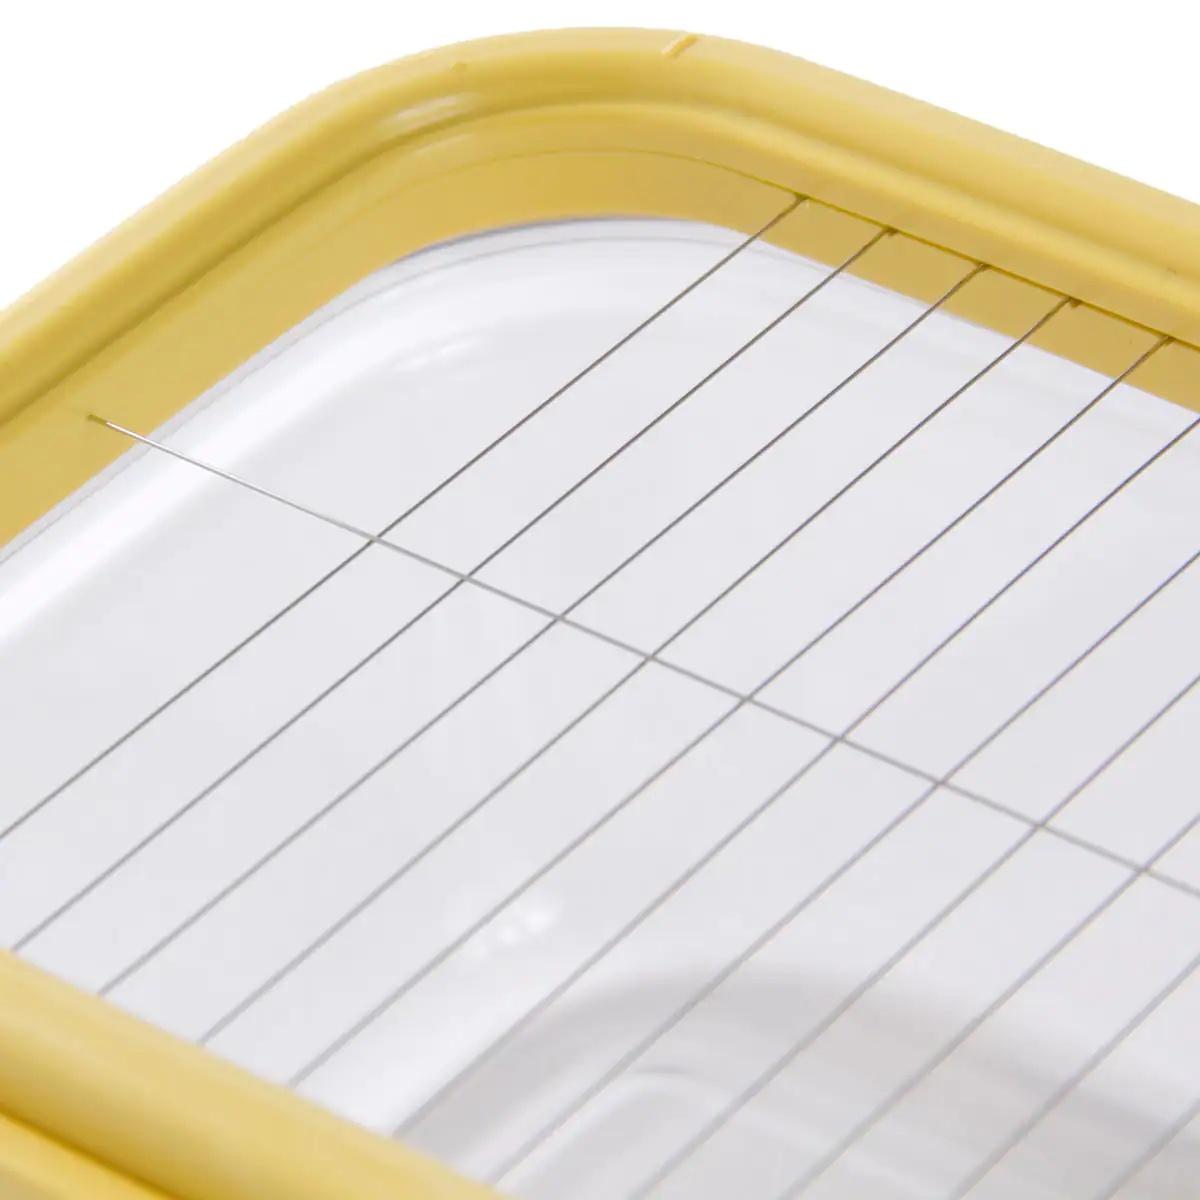 NITORI(ニトリ) バターケースの商品画像11